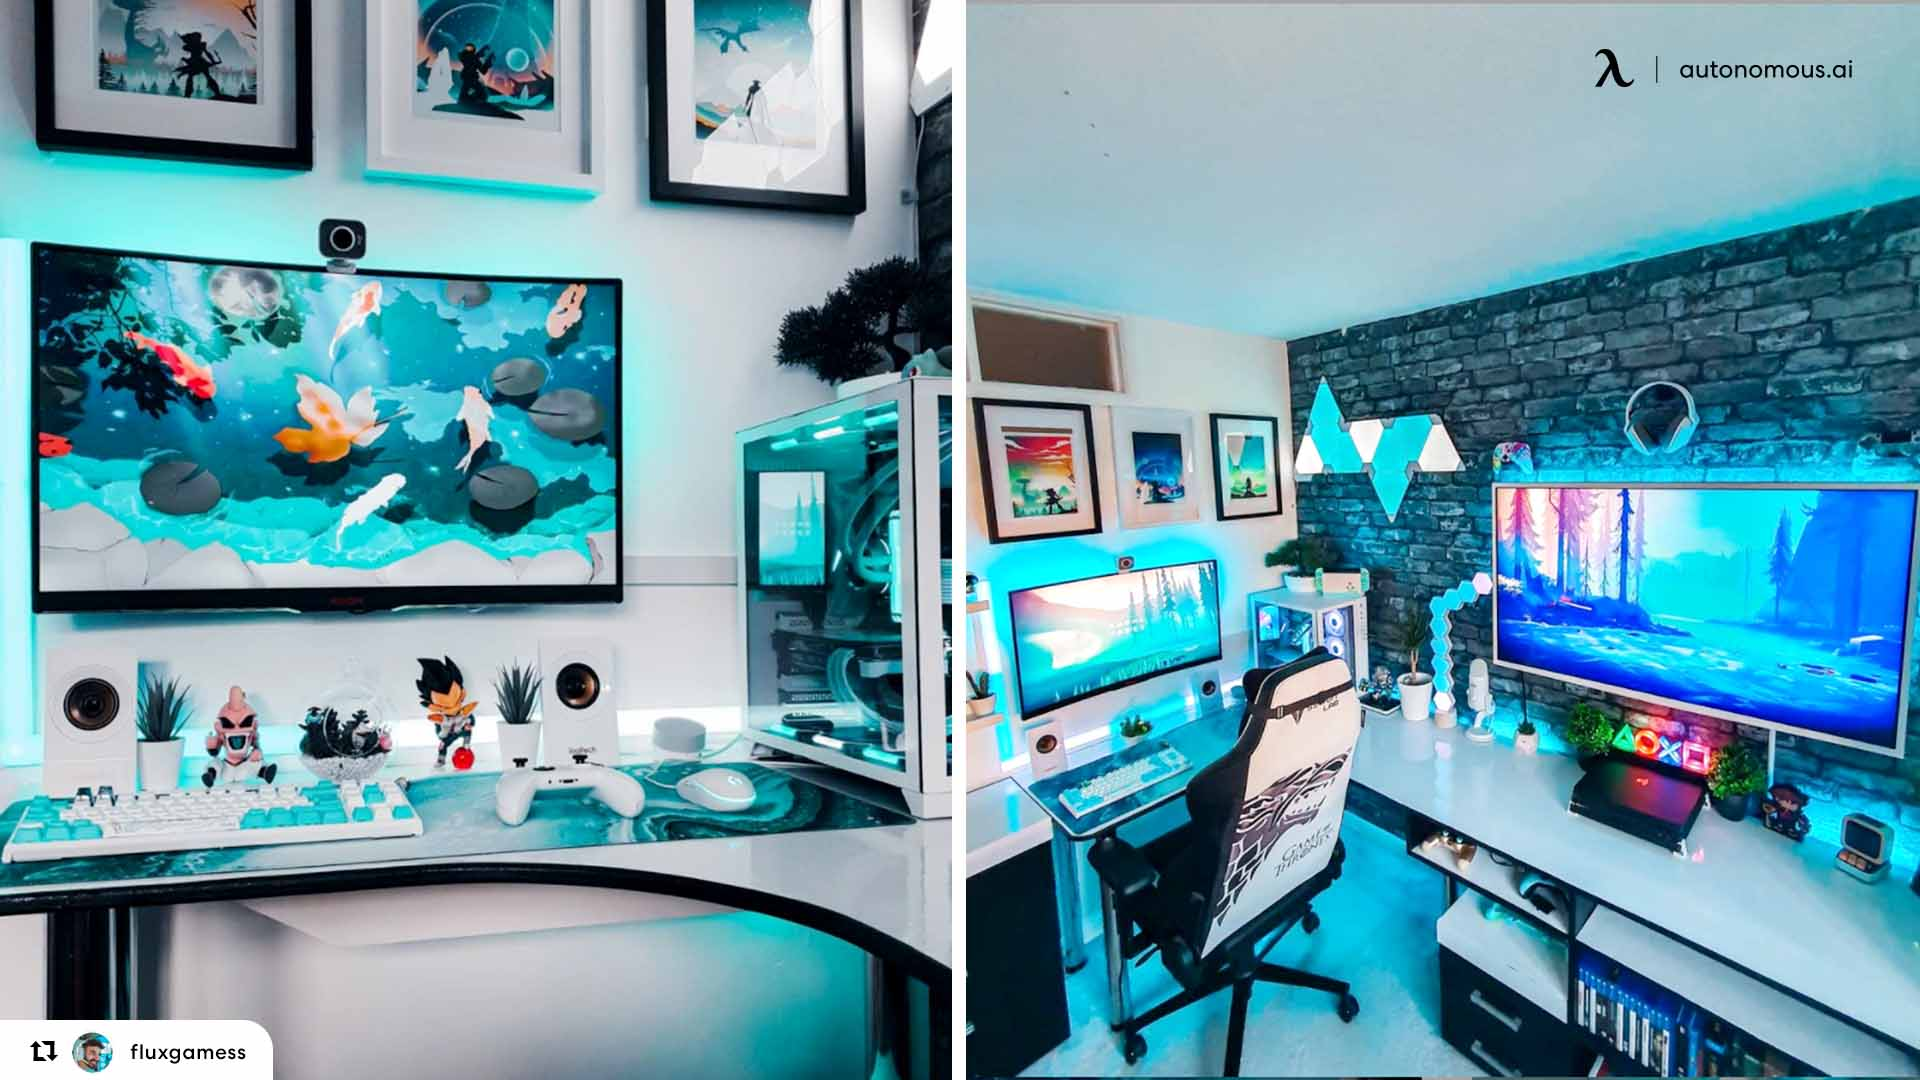 The Colorful LED Home Office Light Desk Setup